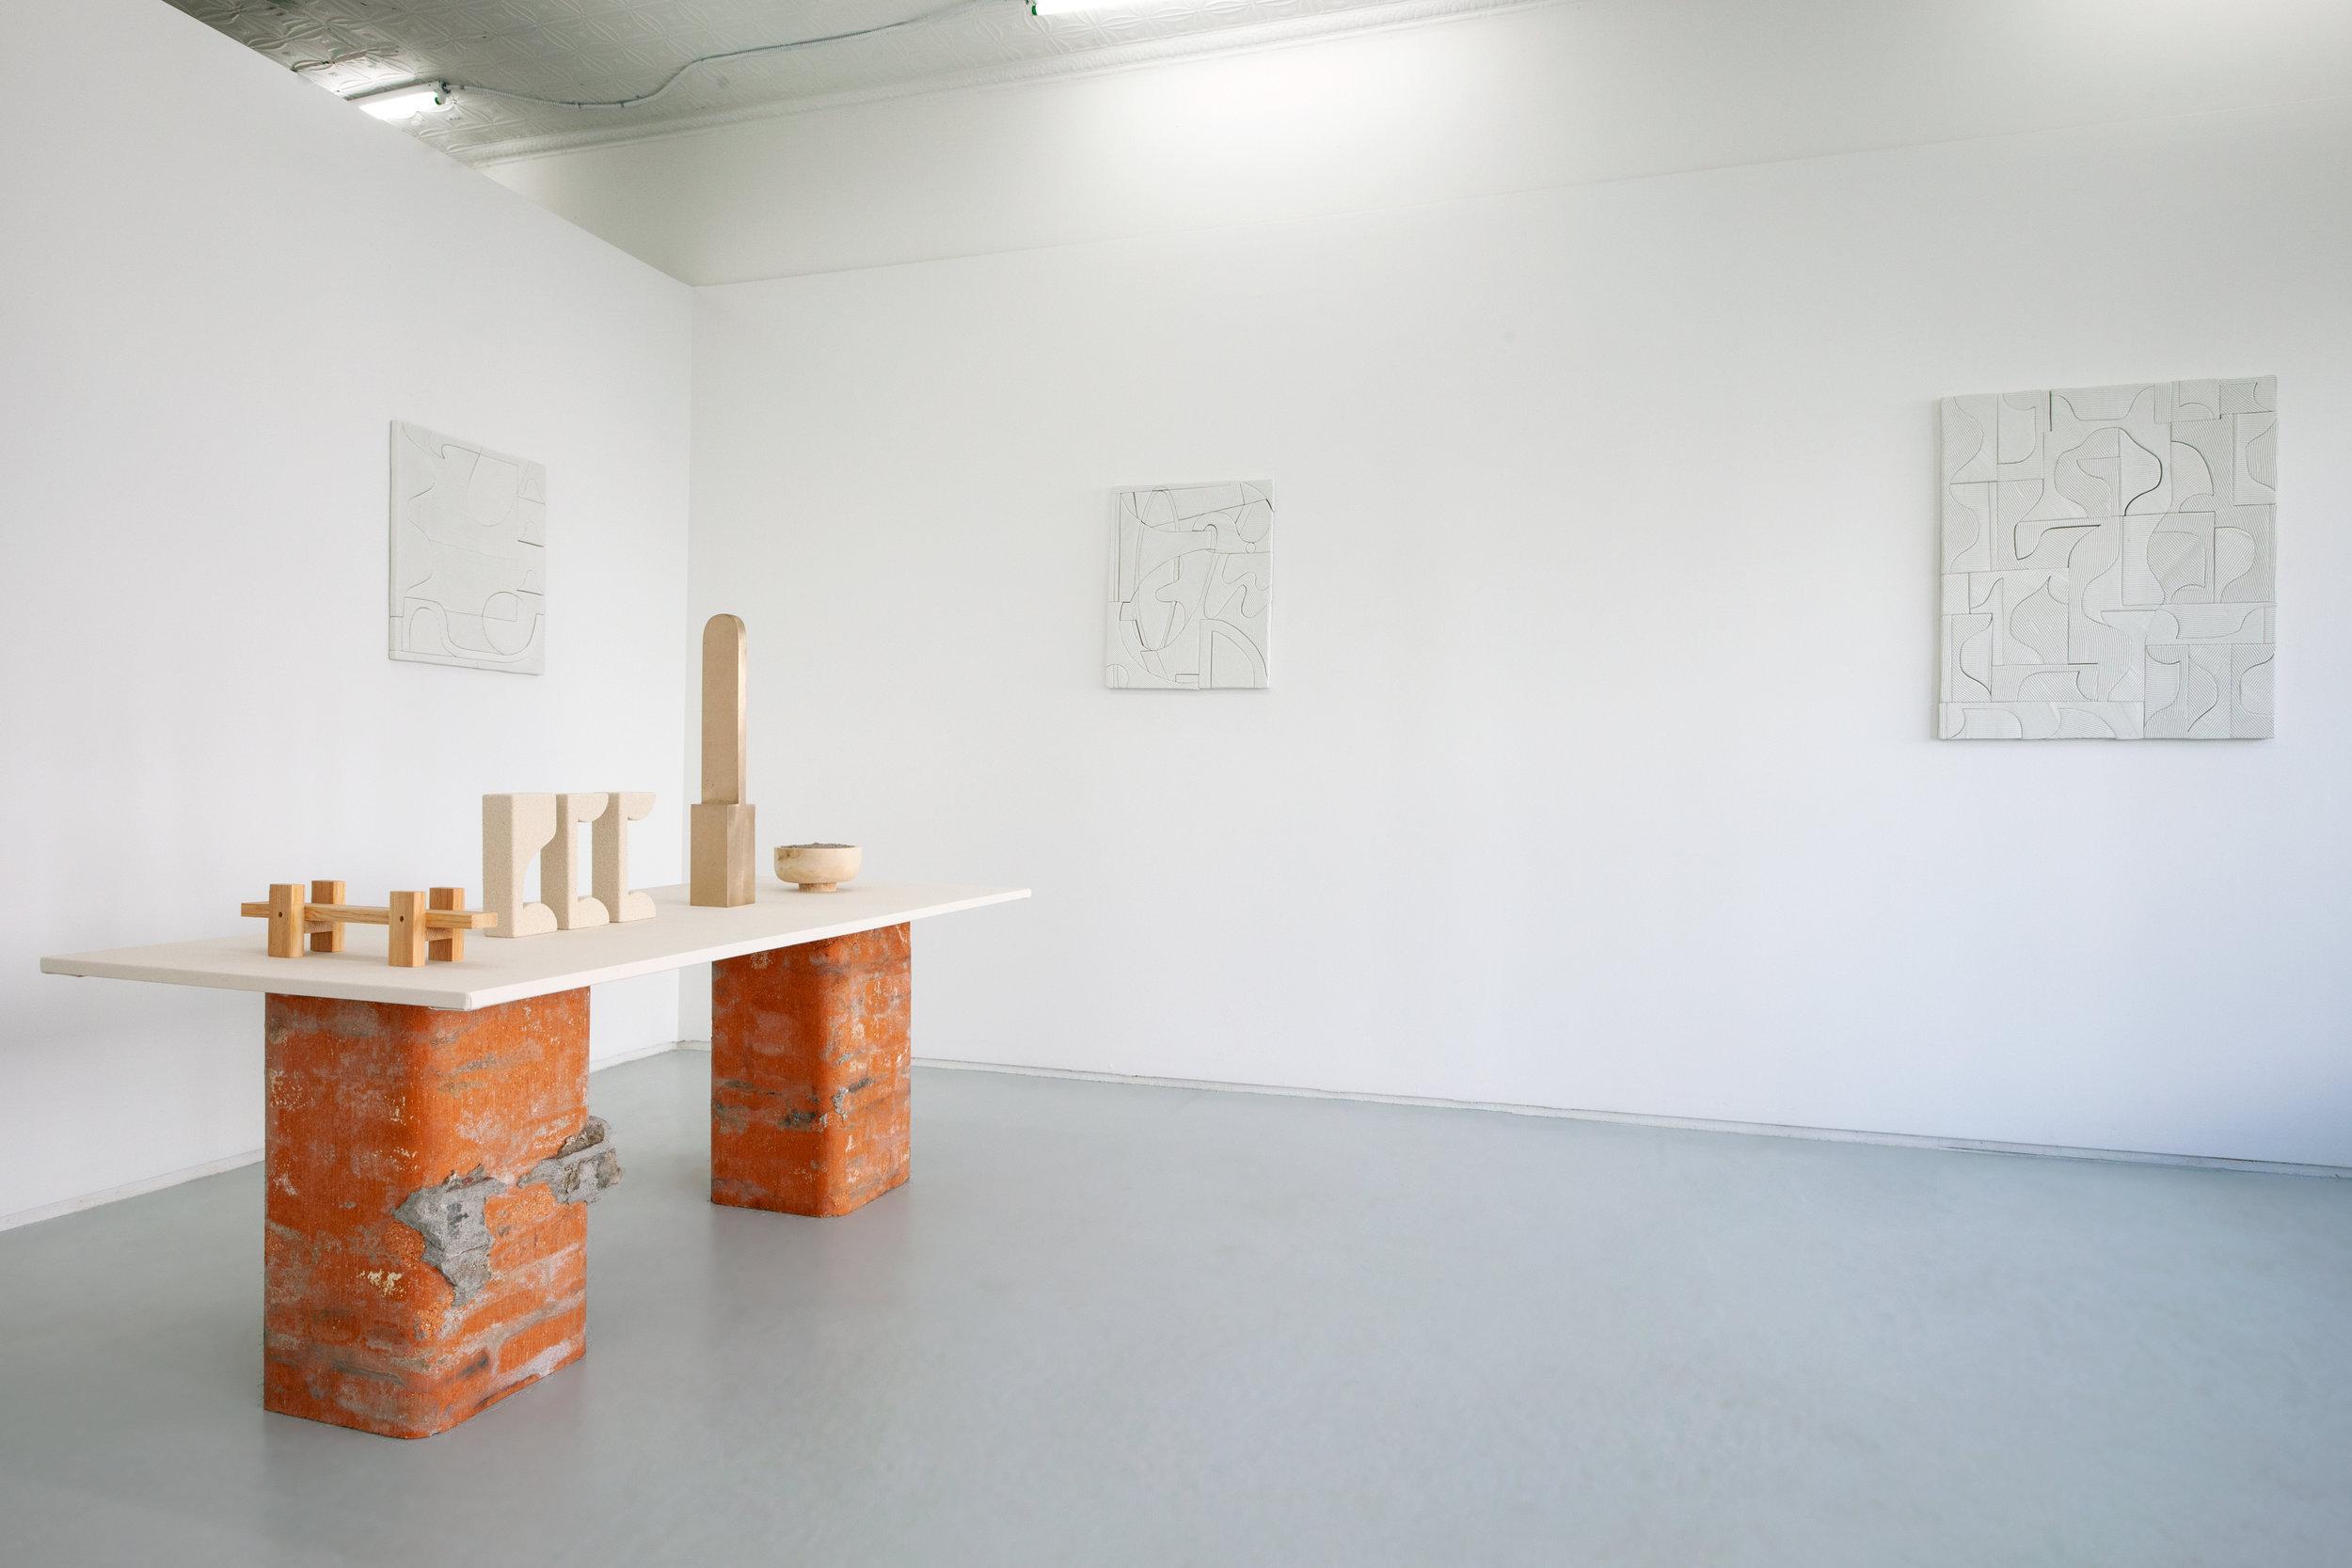 Elizabeth_Atterbury-Night_Comes_In-Installation_View_012.jpg